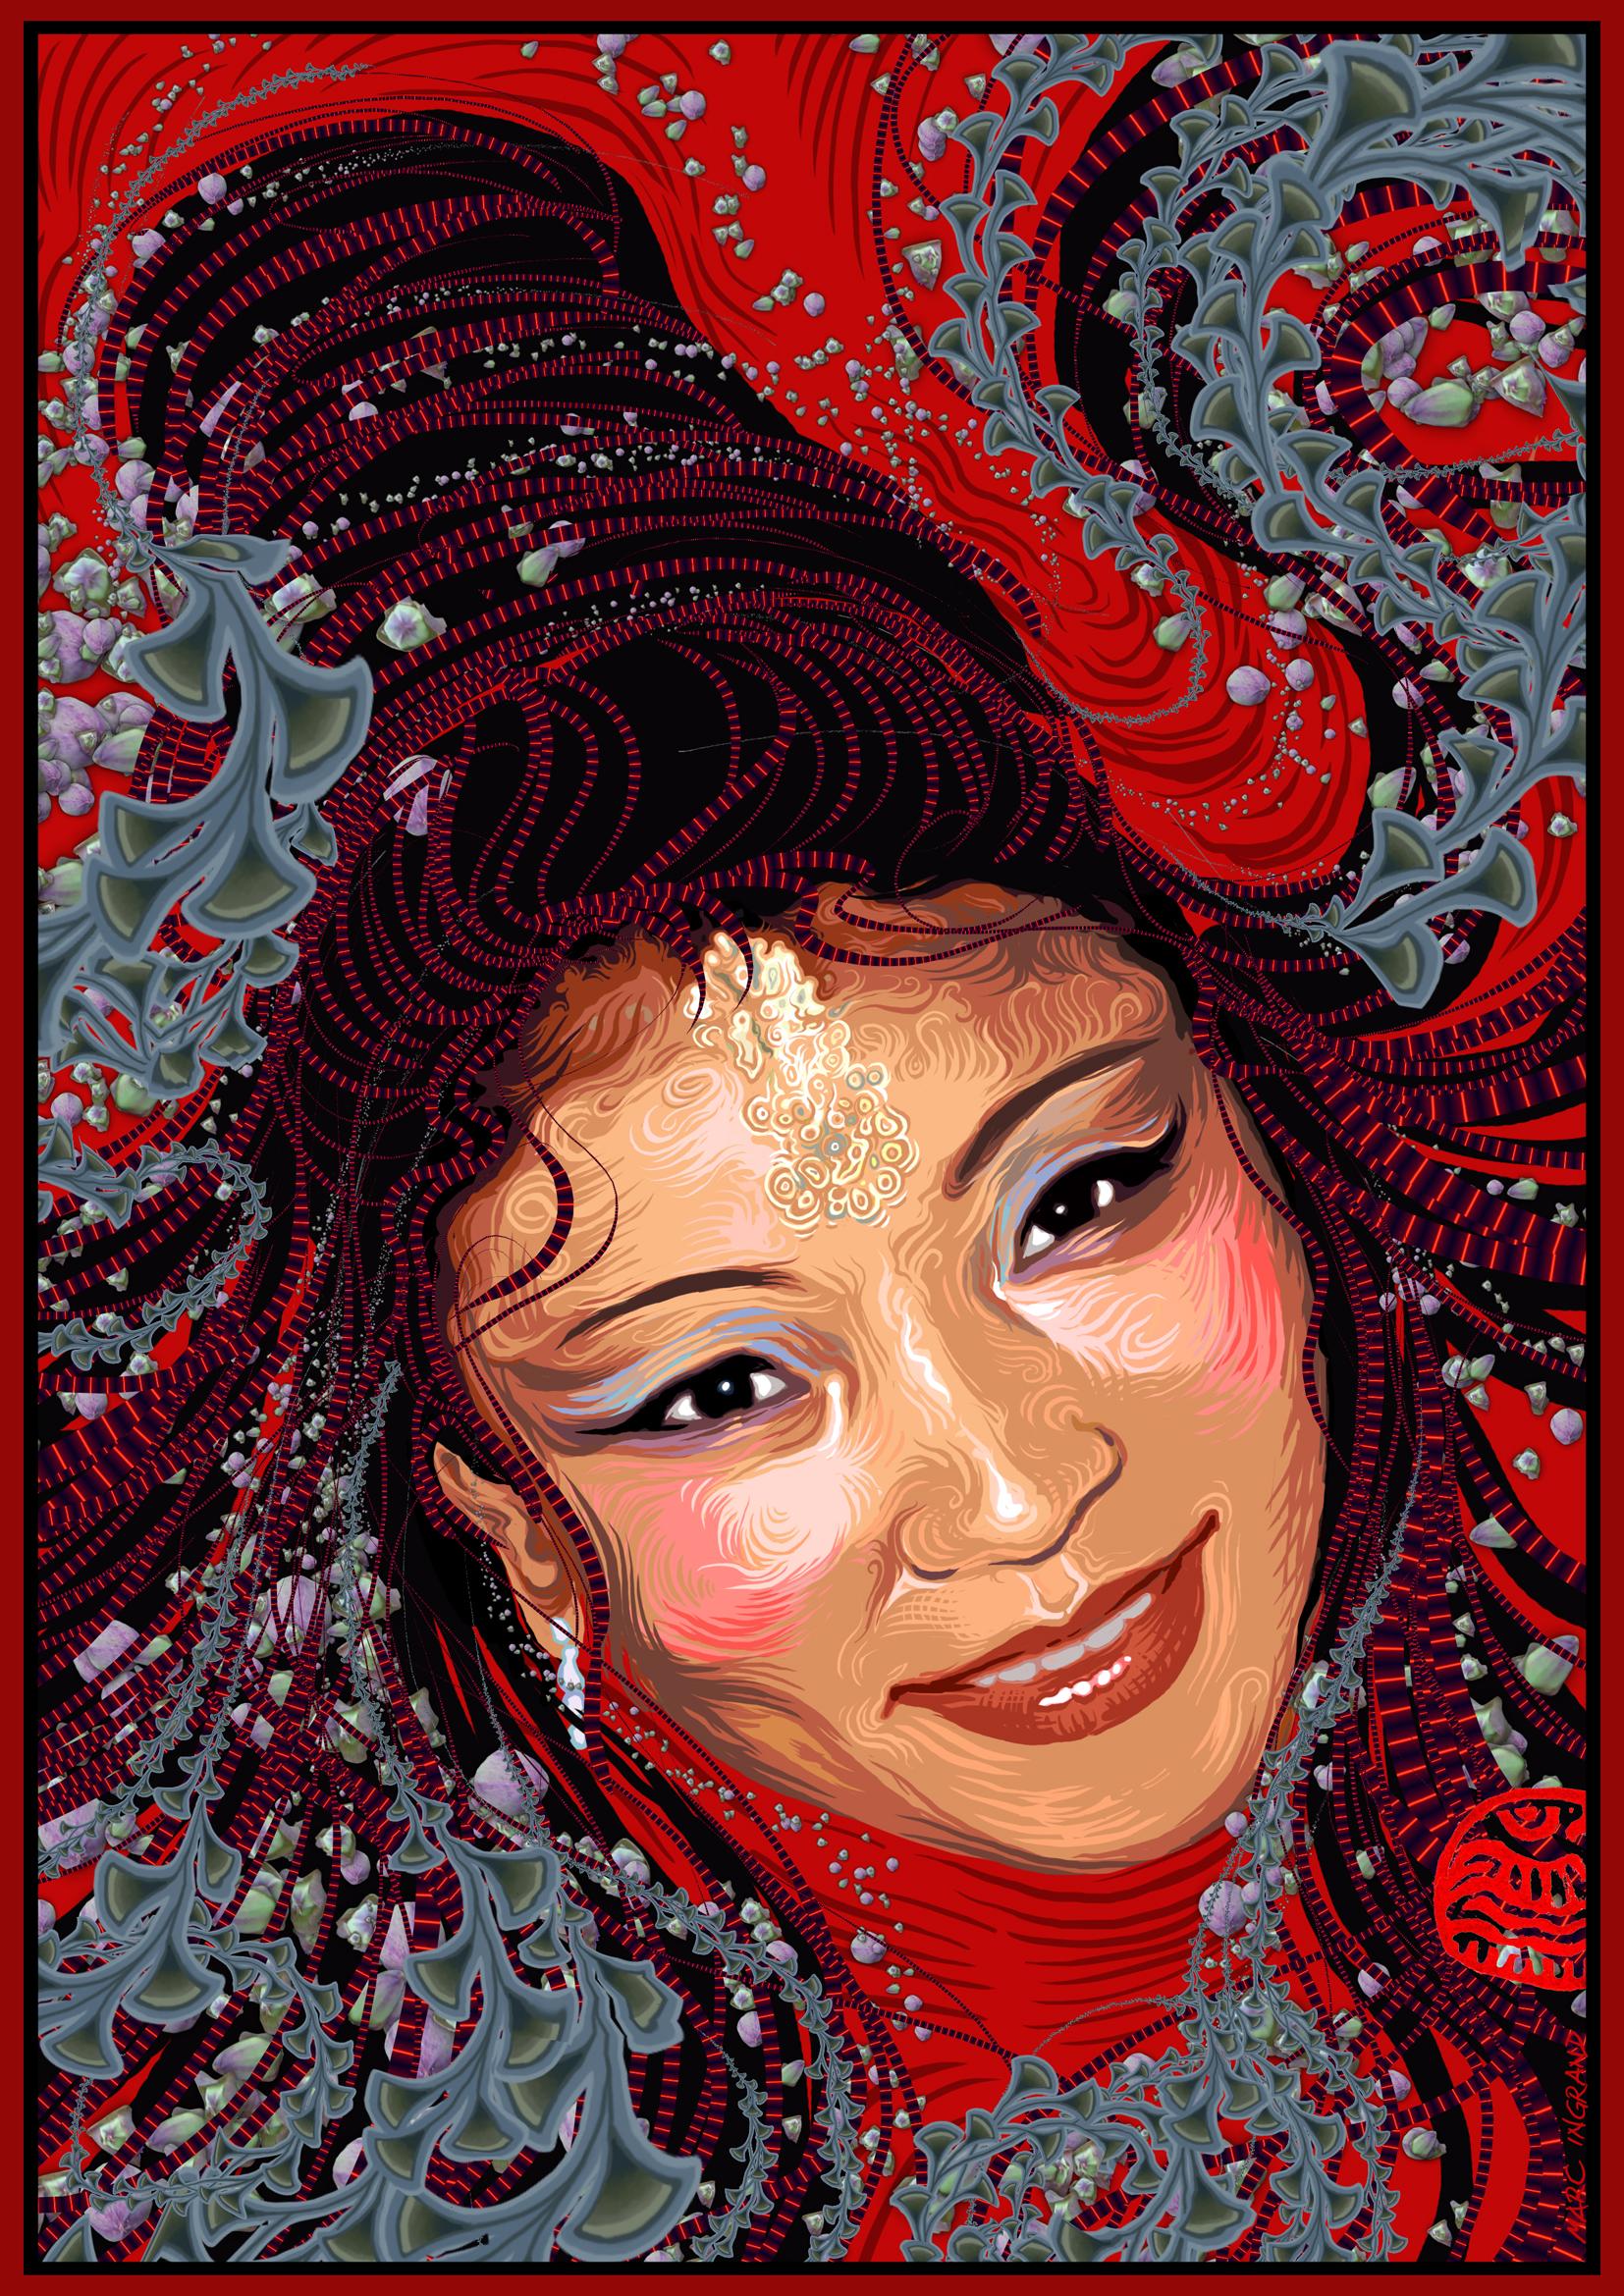 Yungchen Lhamo Art work ILLU01.jpg